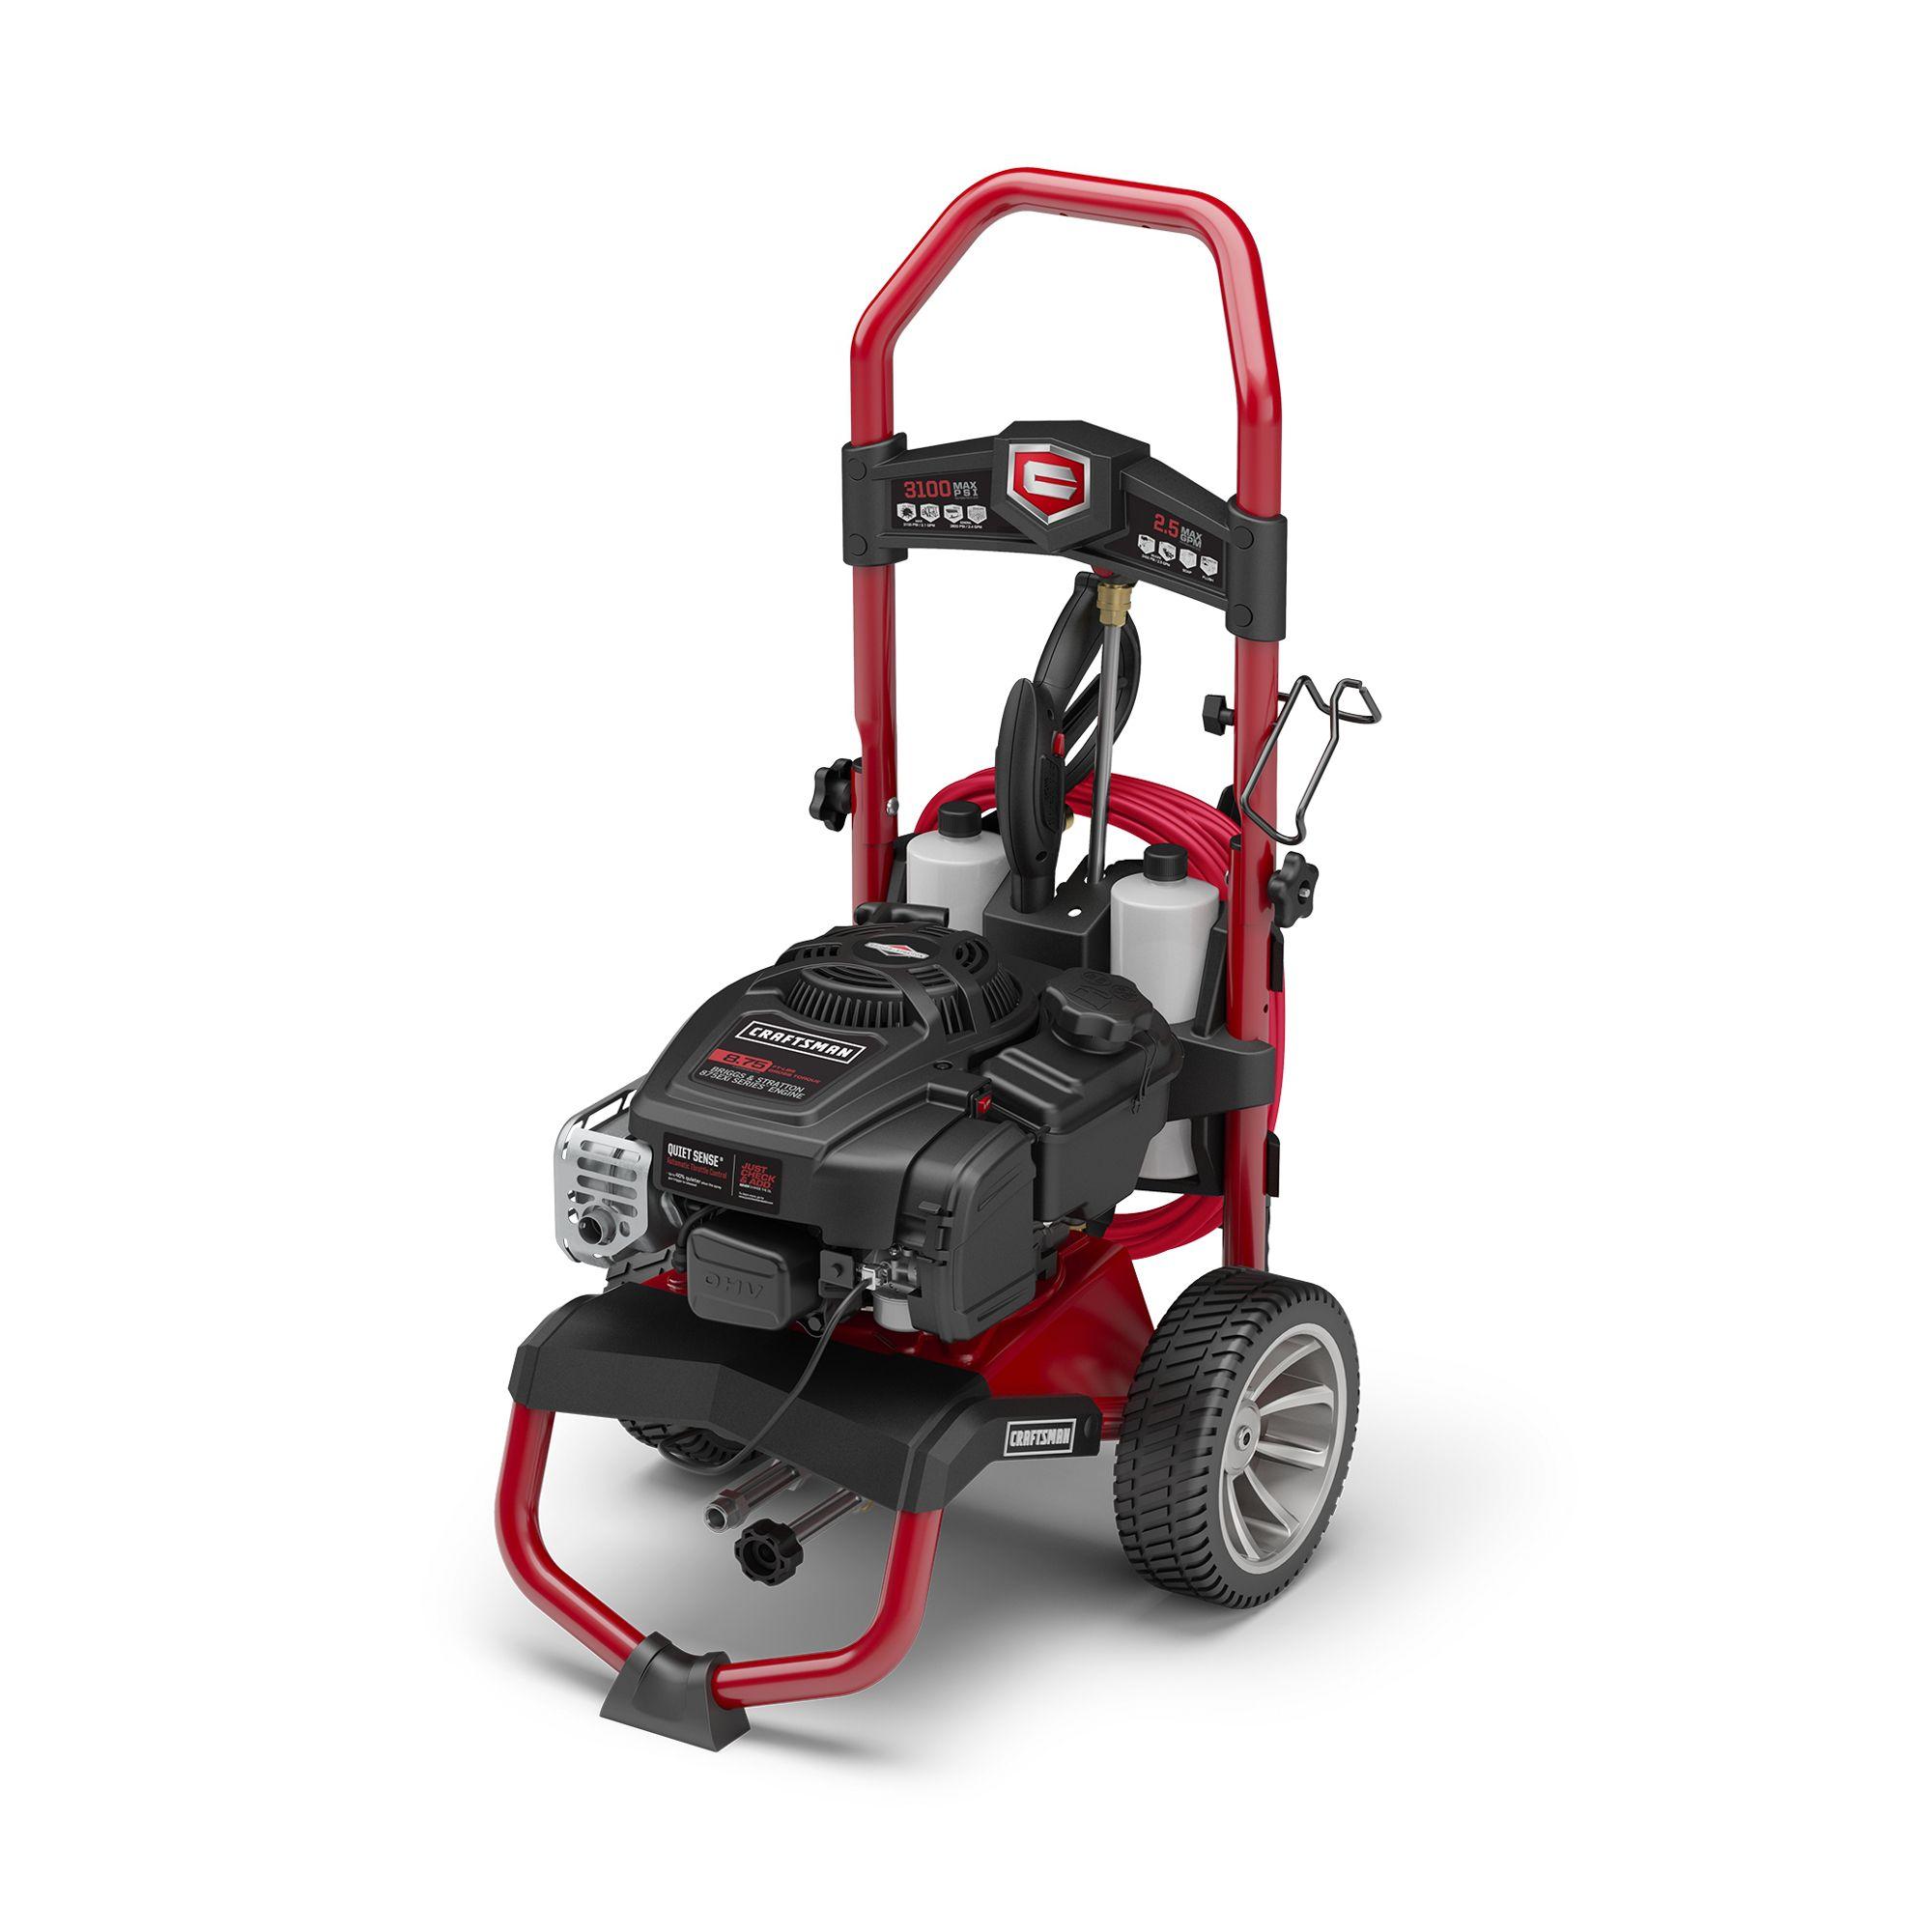 580. 752330 craftsman pressure washer 6. 75 hp 2550 psi 2 gpm.